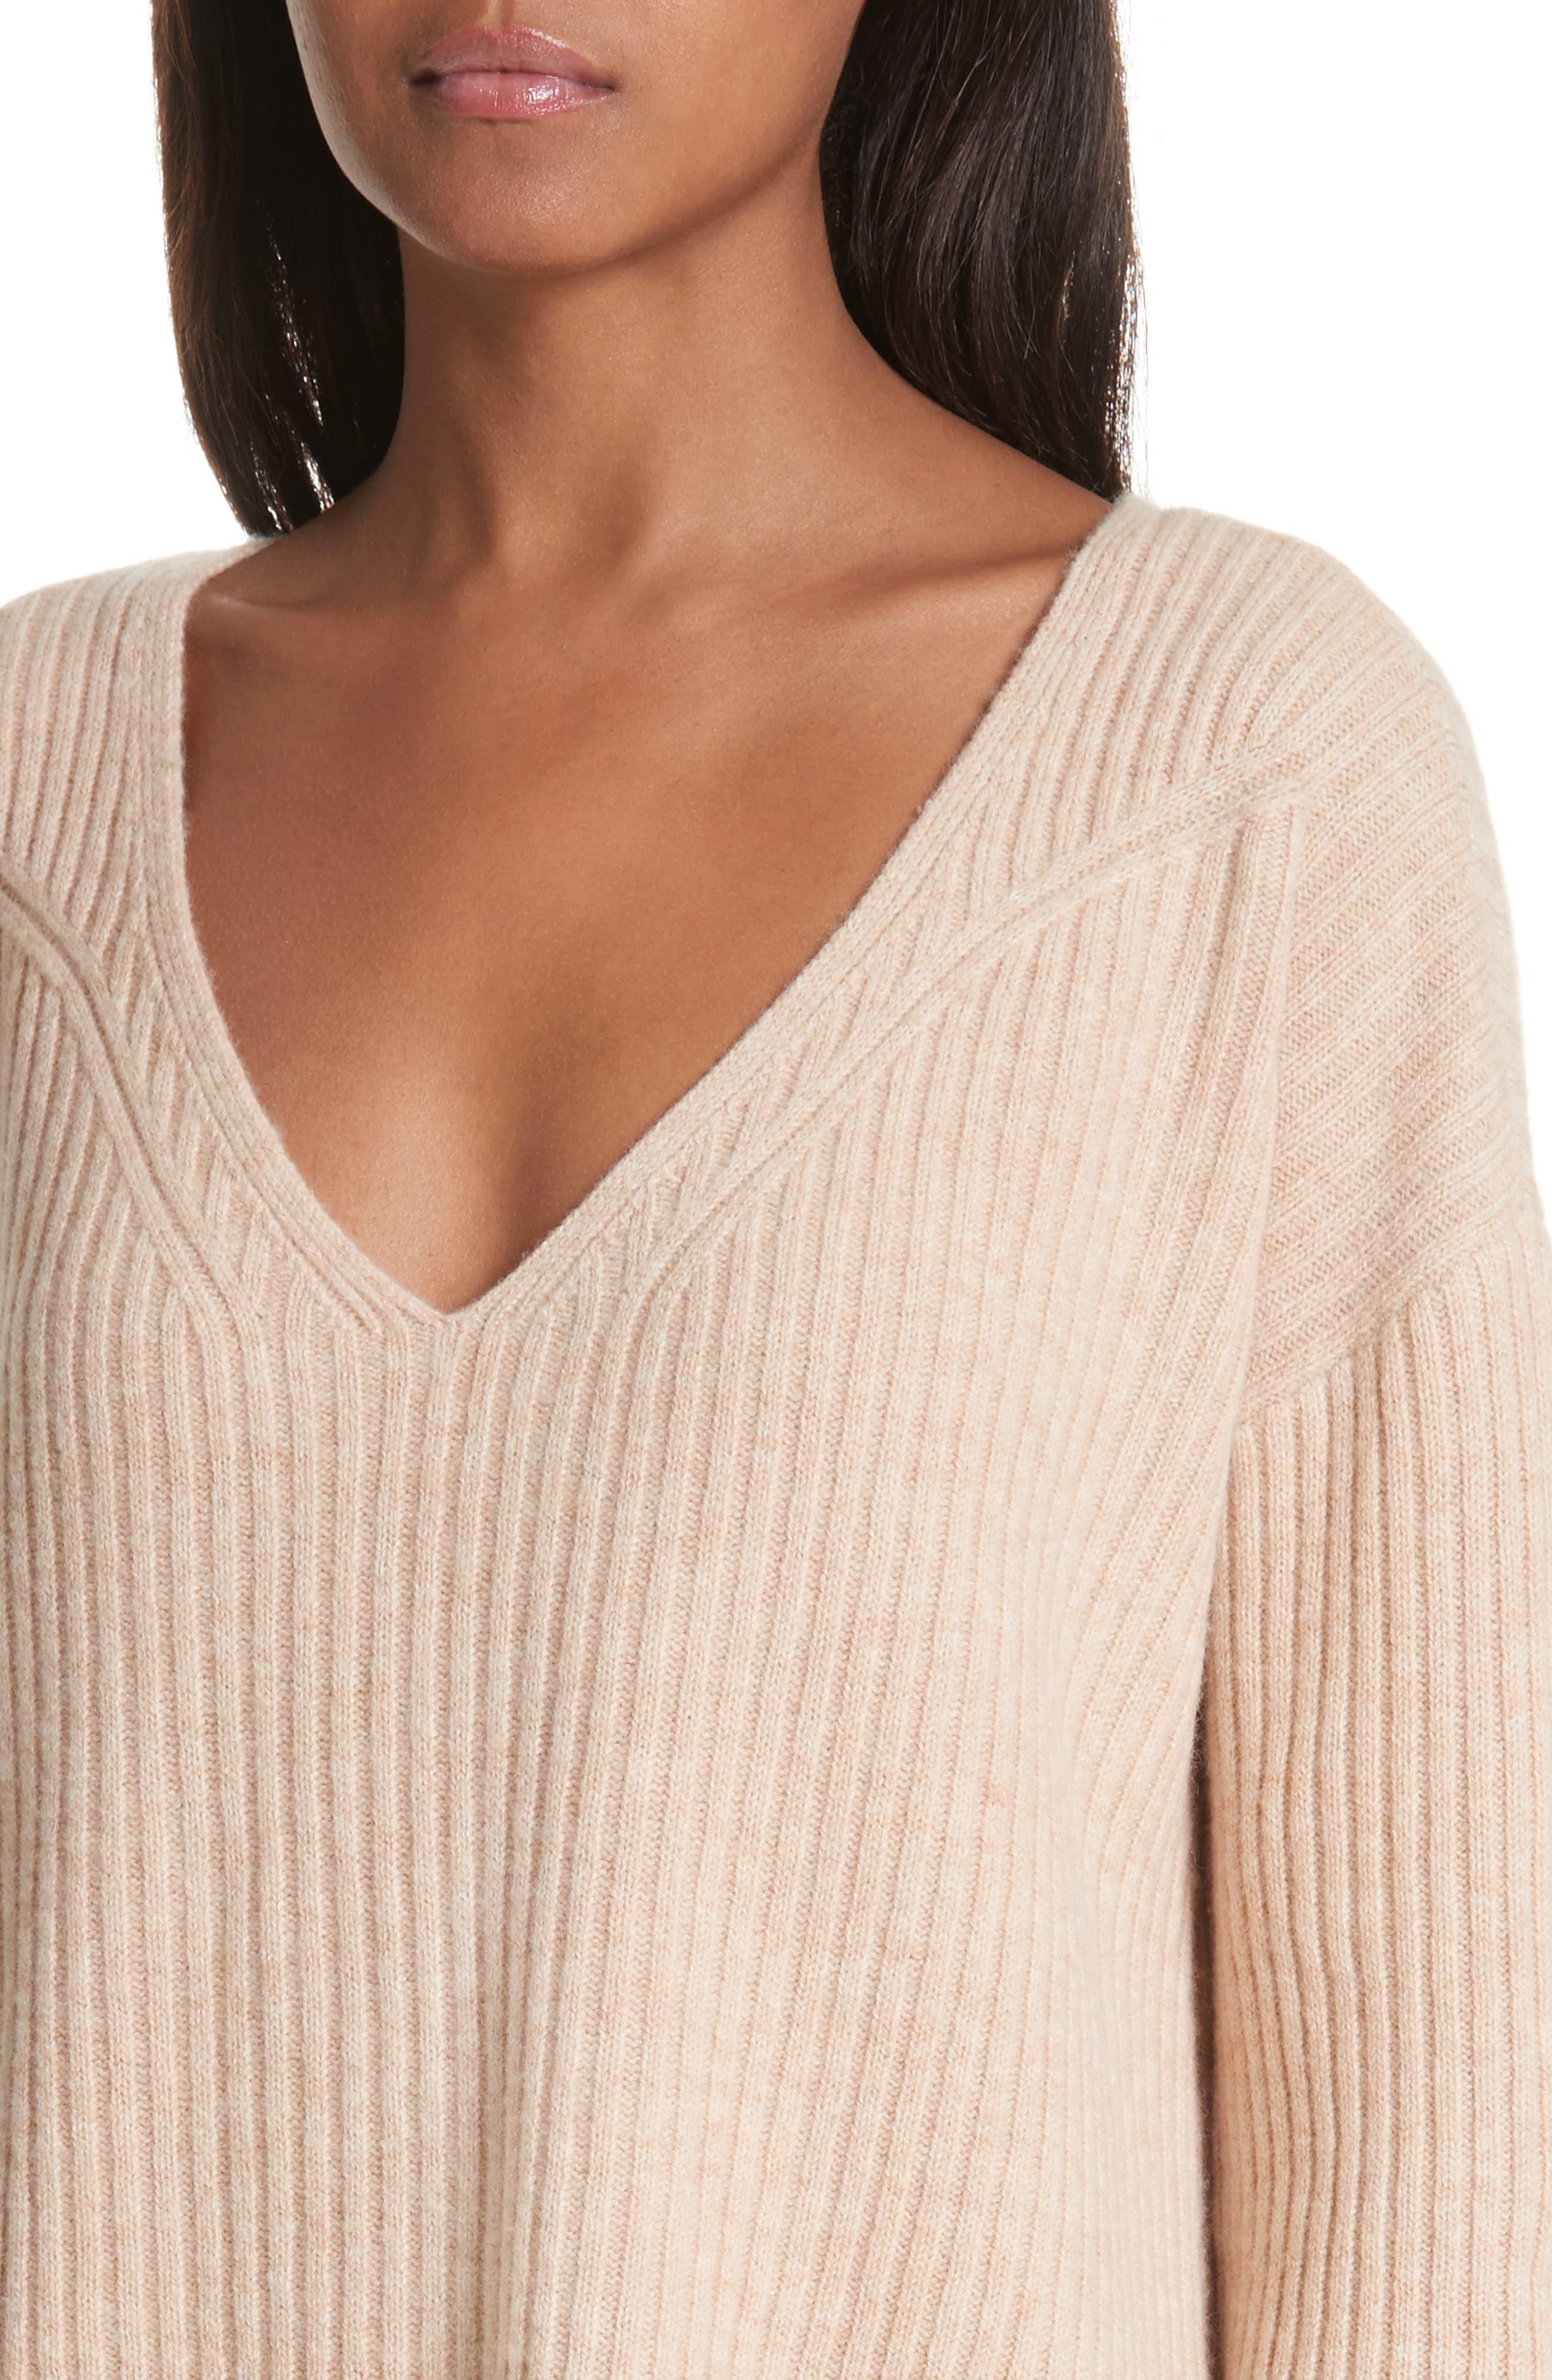 Mitchell Merino Wool Sweater,                             Alternate thumbnail 4, color,                             Oat